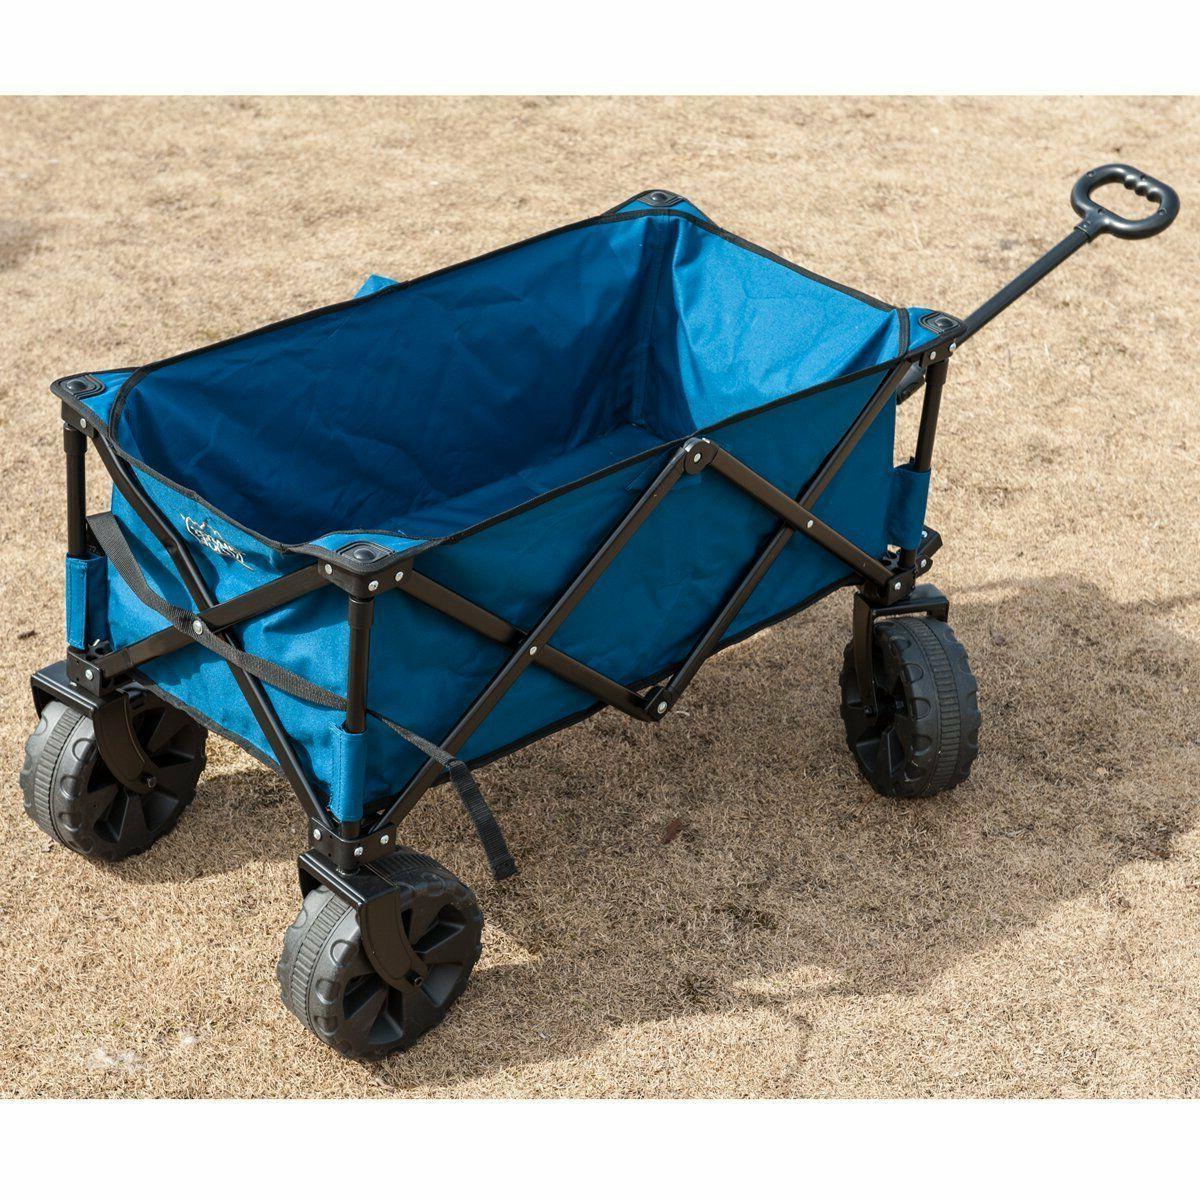 Folding Camping Collapsible Steel Shopping Garden/Beach Wagon/Cart